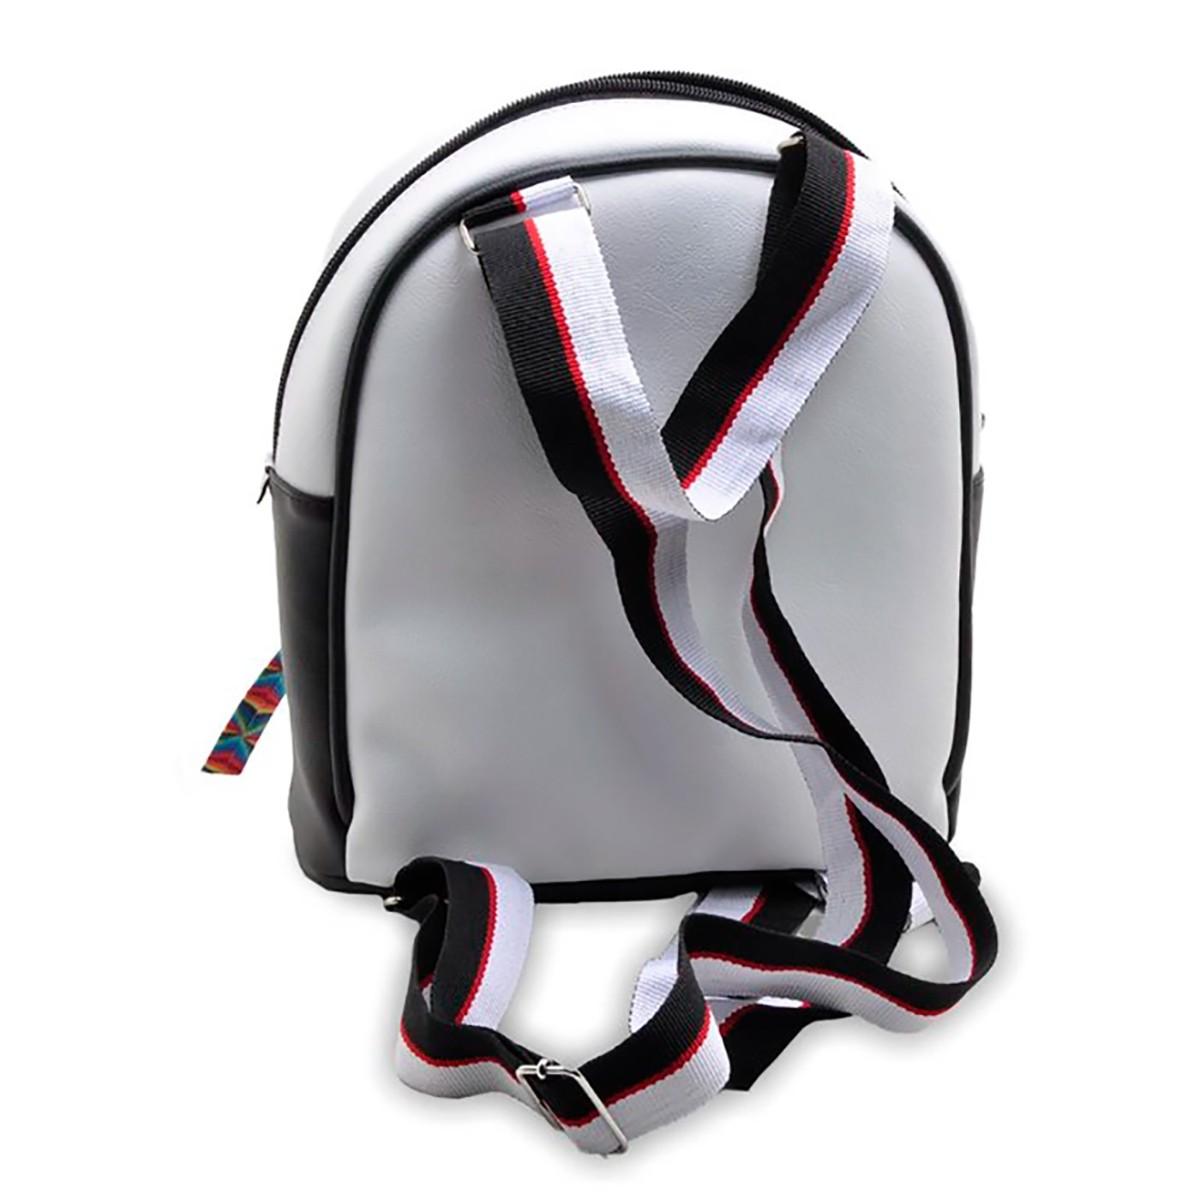 Mochila Pampili Now United Mini Bag Tweenie